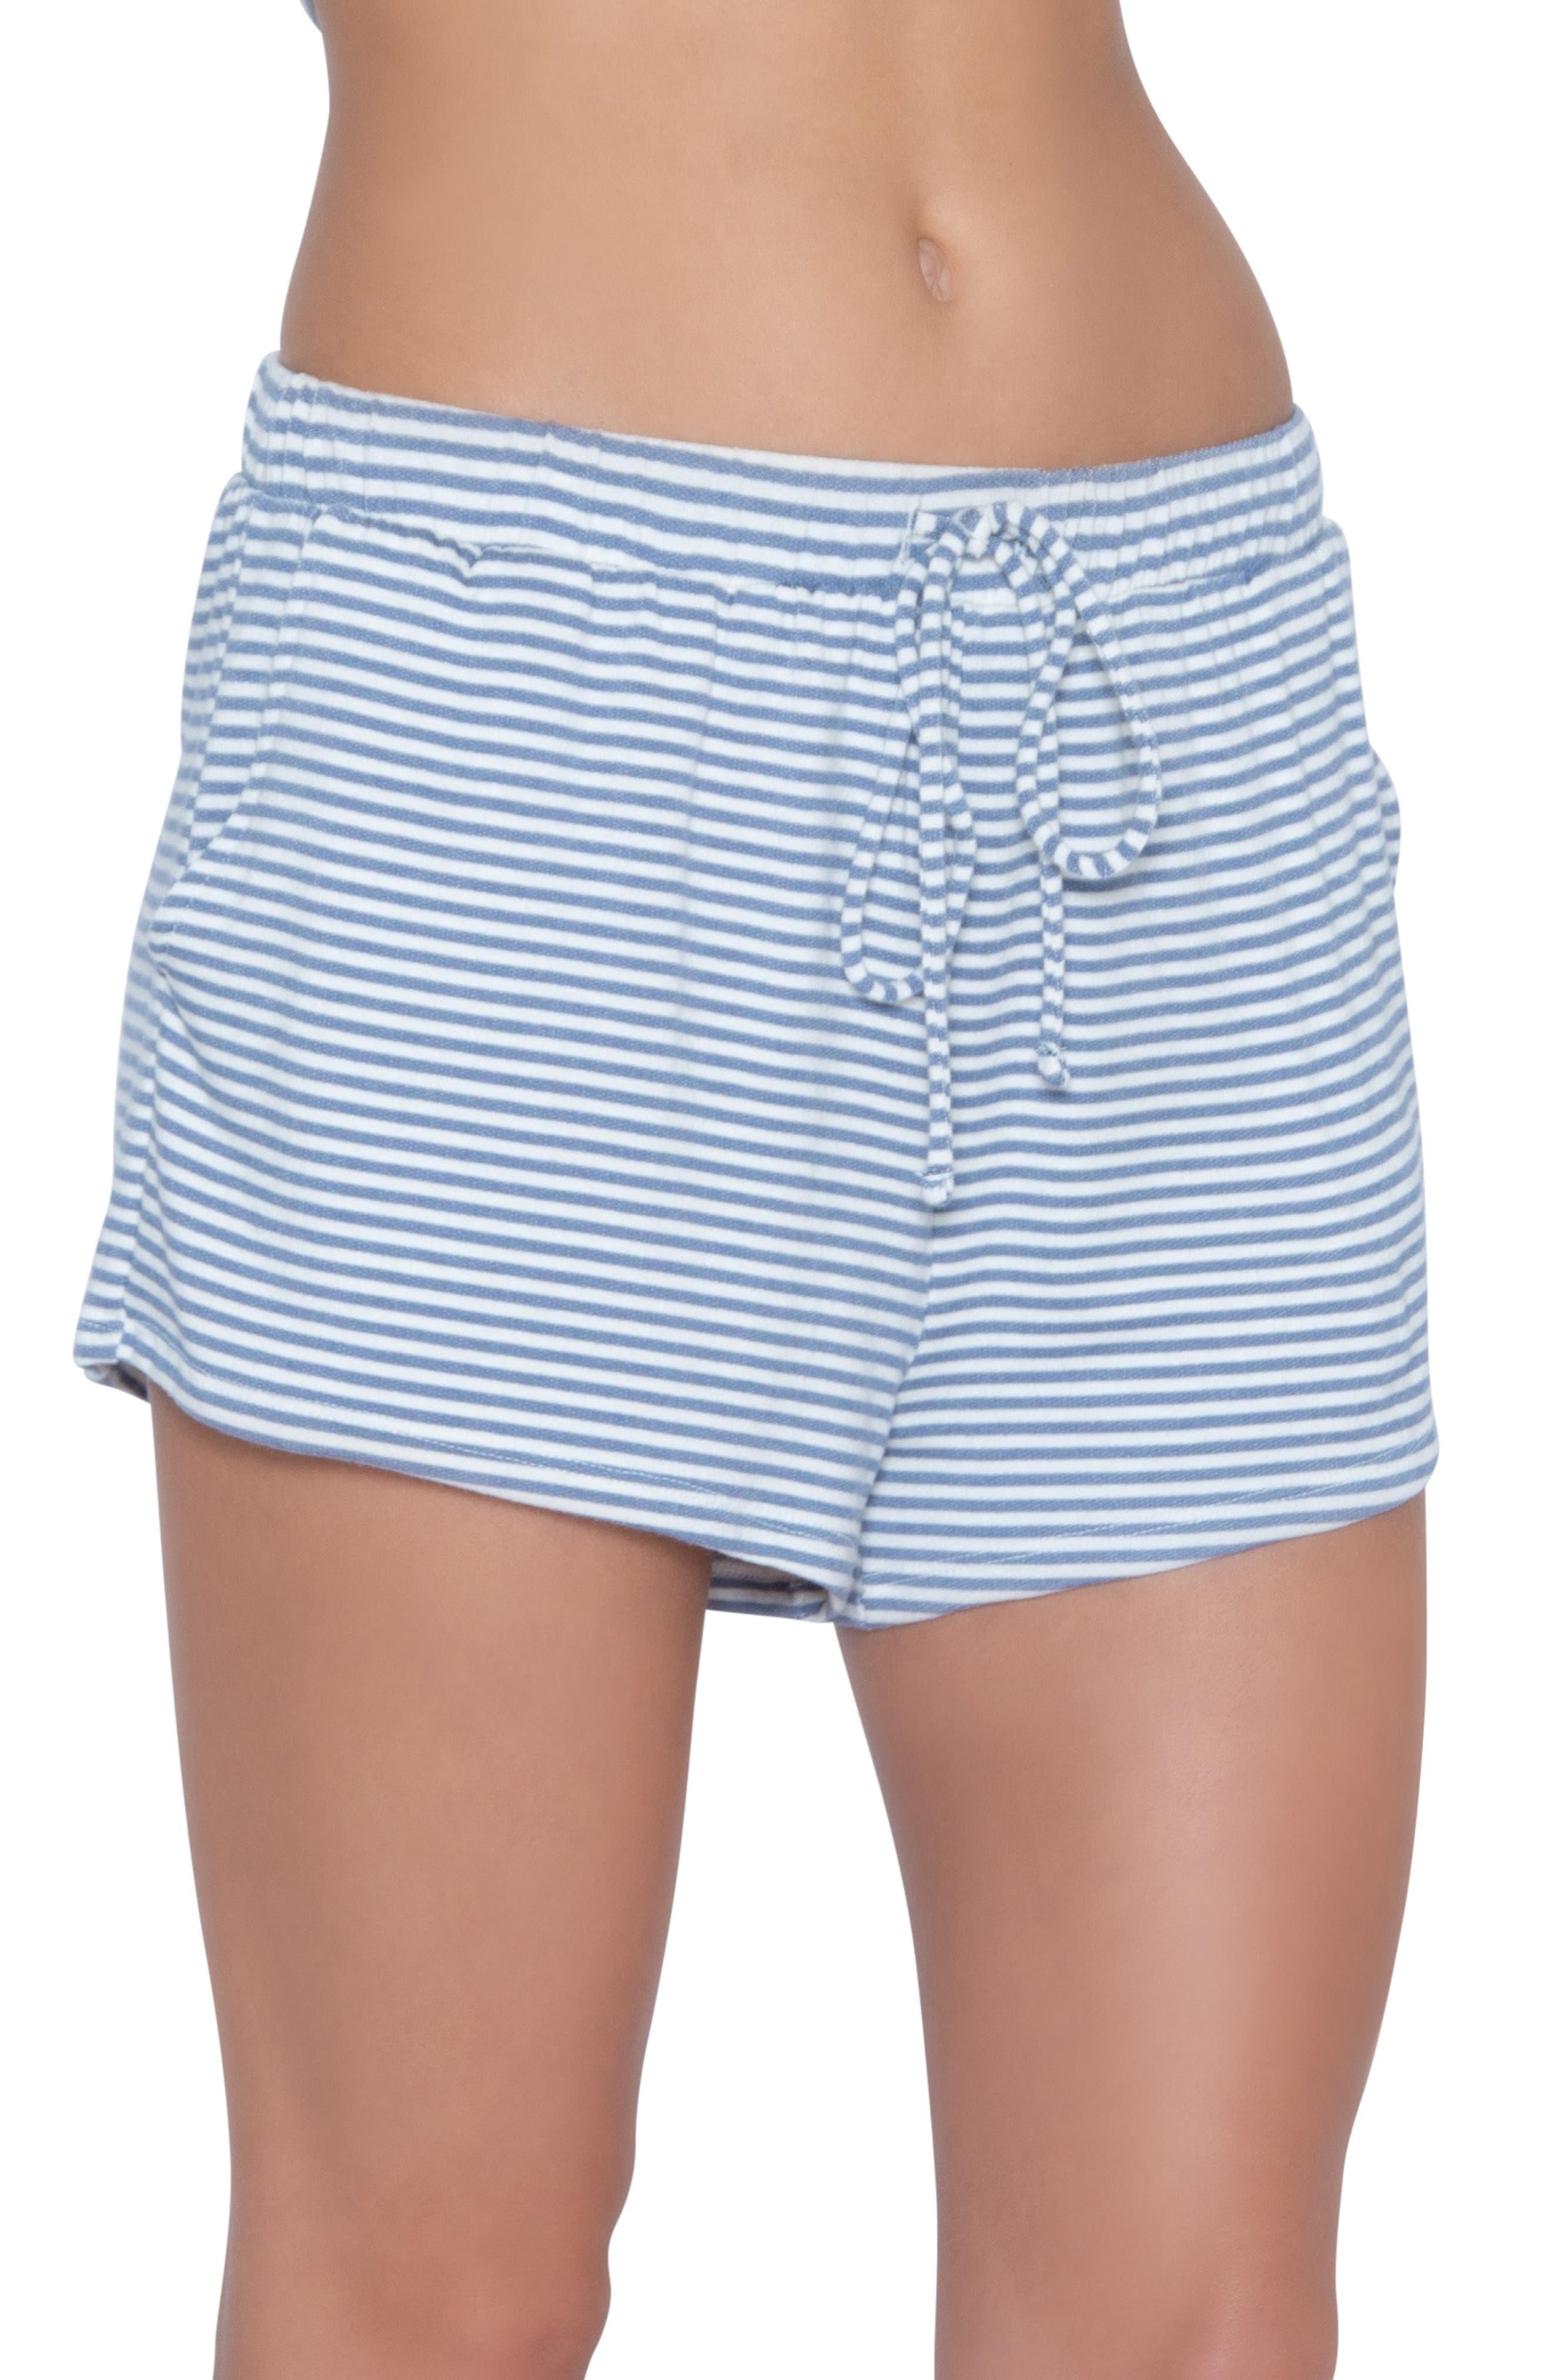 Eberjey Sadie Stripes Pajama Shorts, Blue